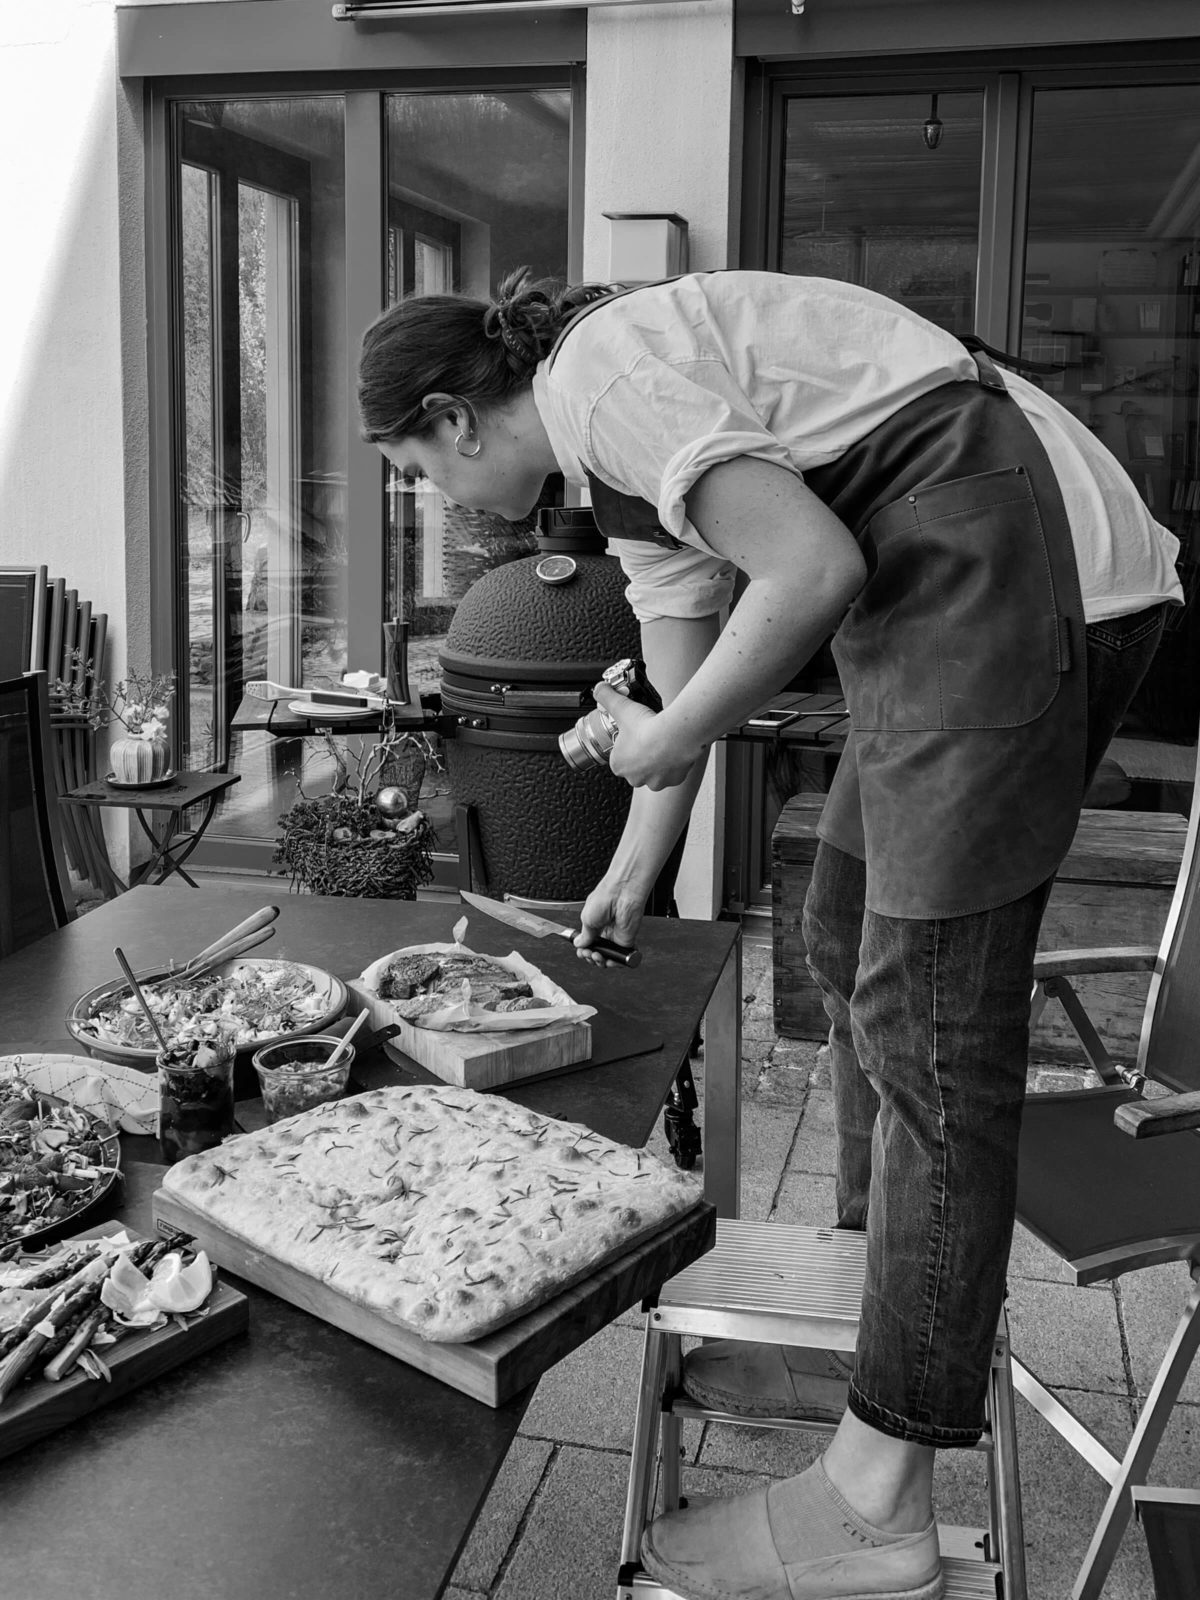 Kochen | Grillen |Food Magazin |Behind the Scene